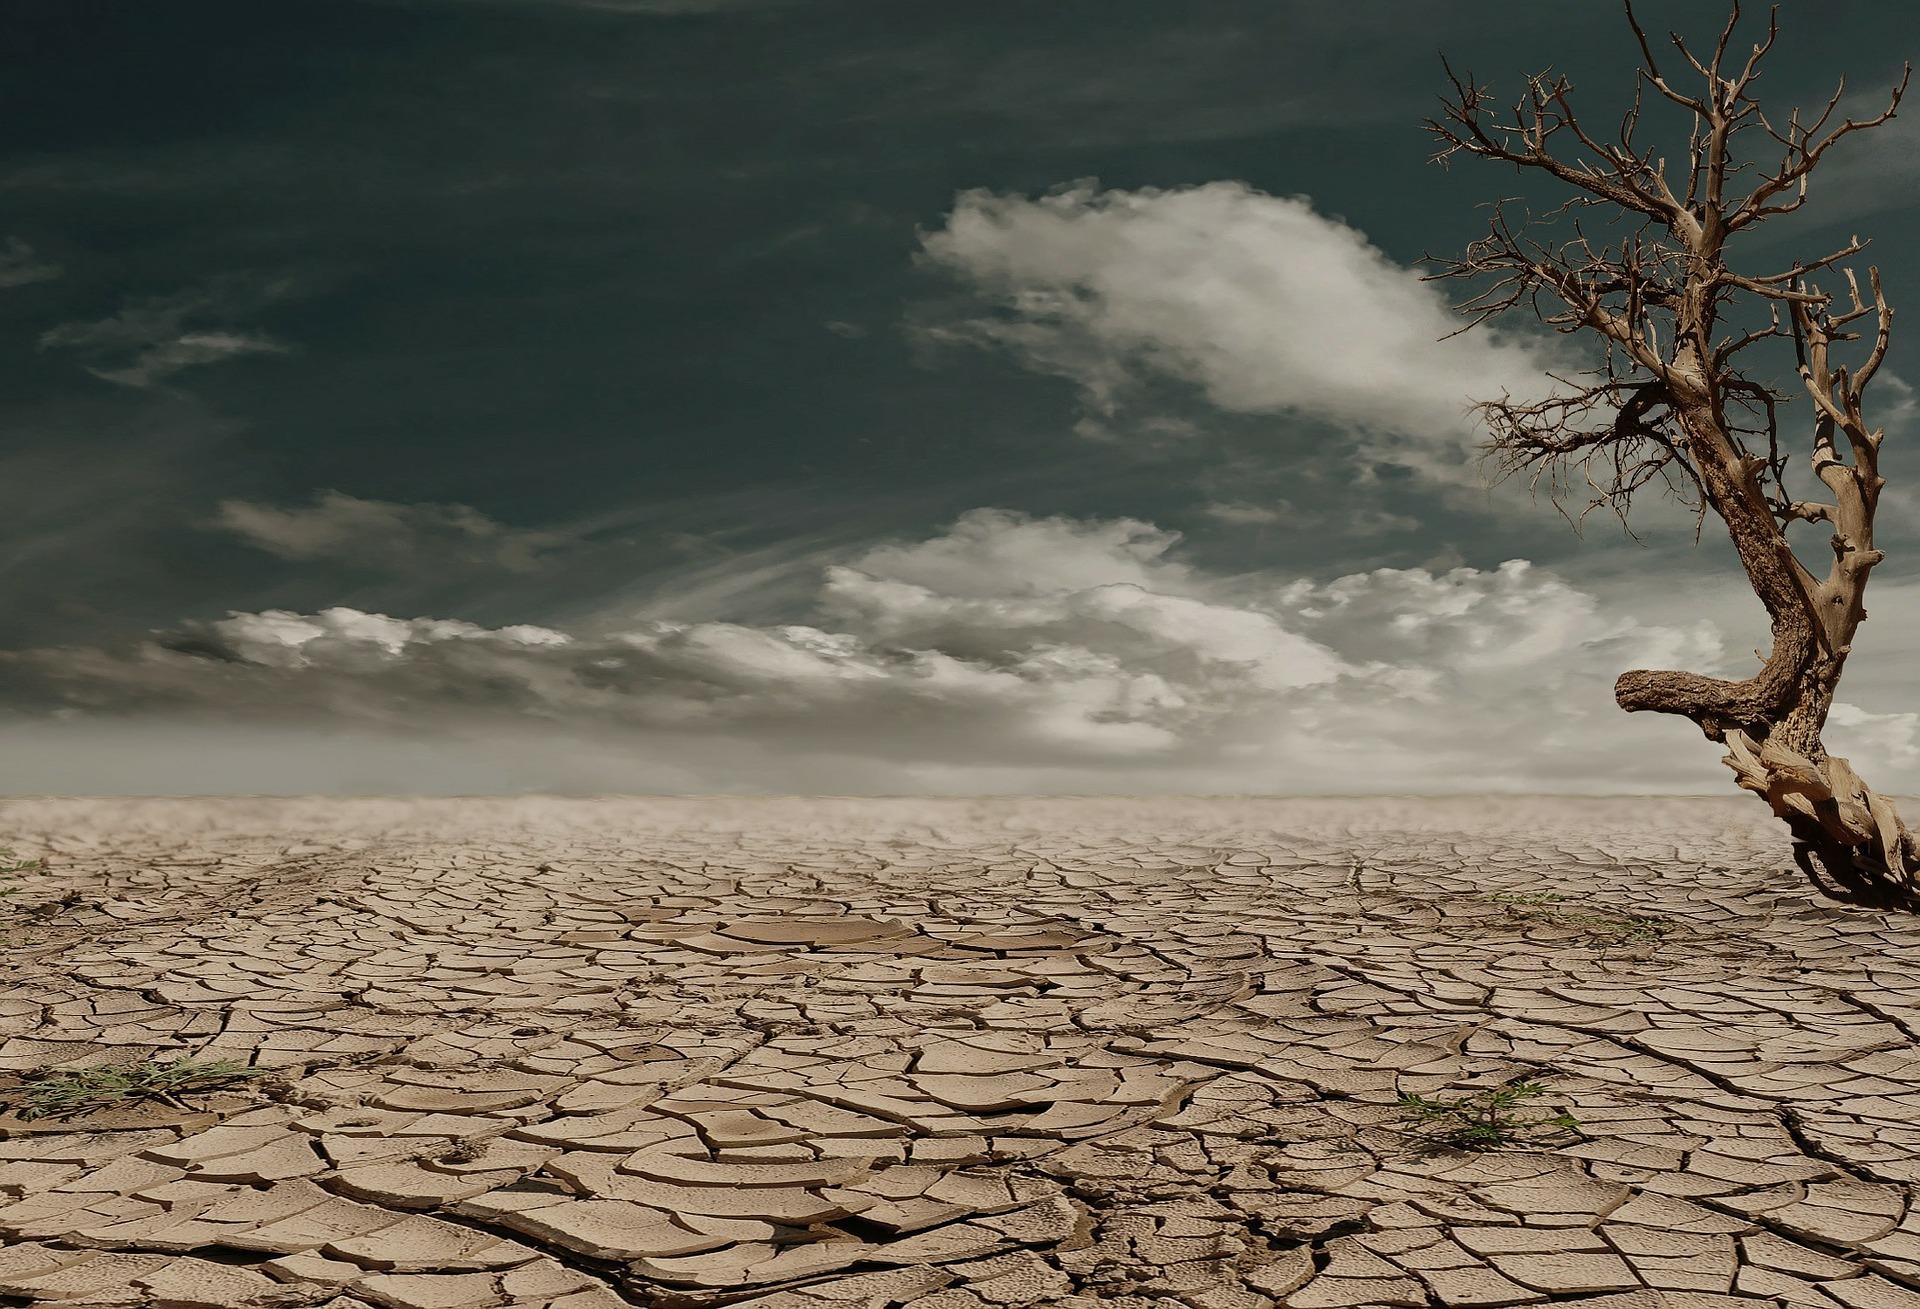 drought, desert, lack of work